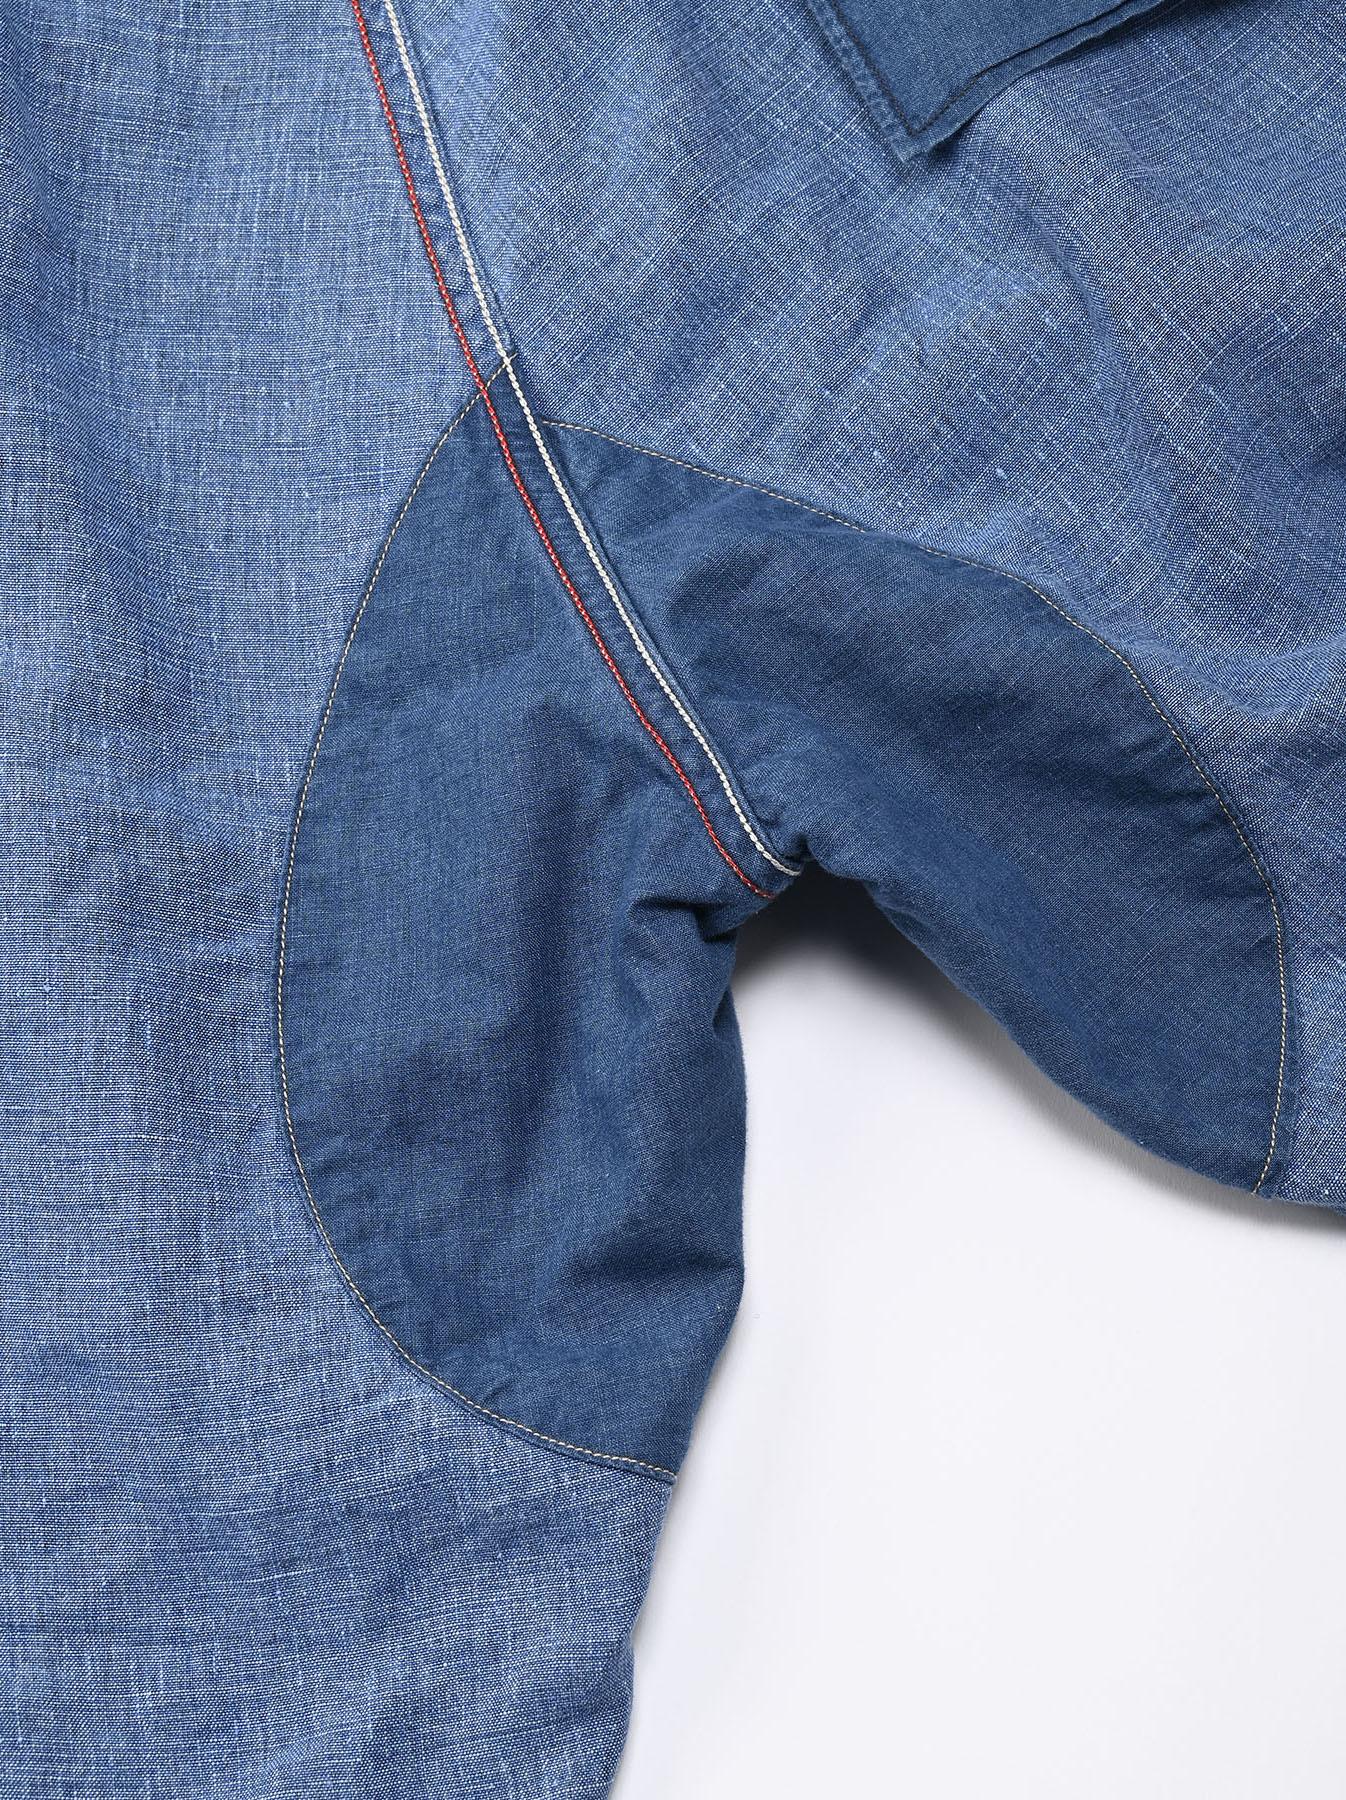 Indigo Linen 908 Easy Sail Shorts Distressed (0721)-12